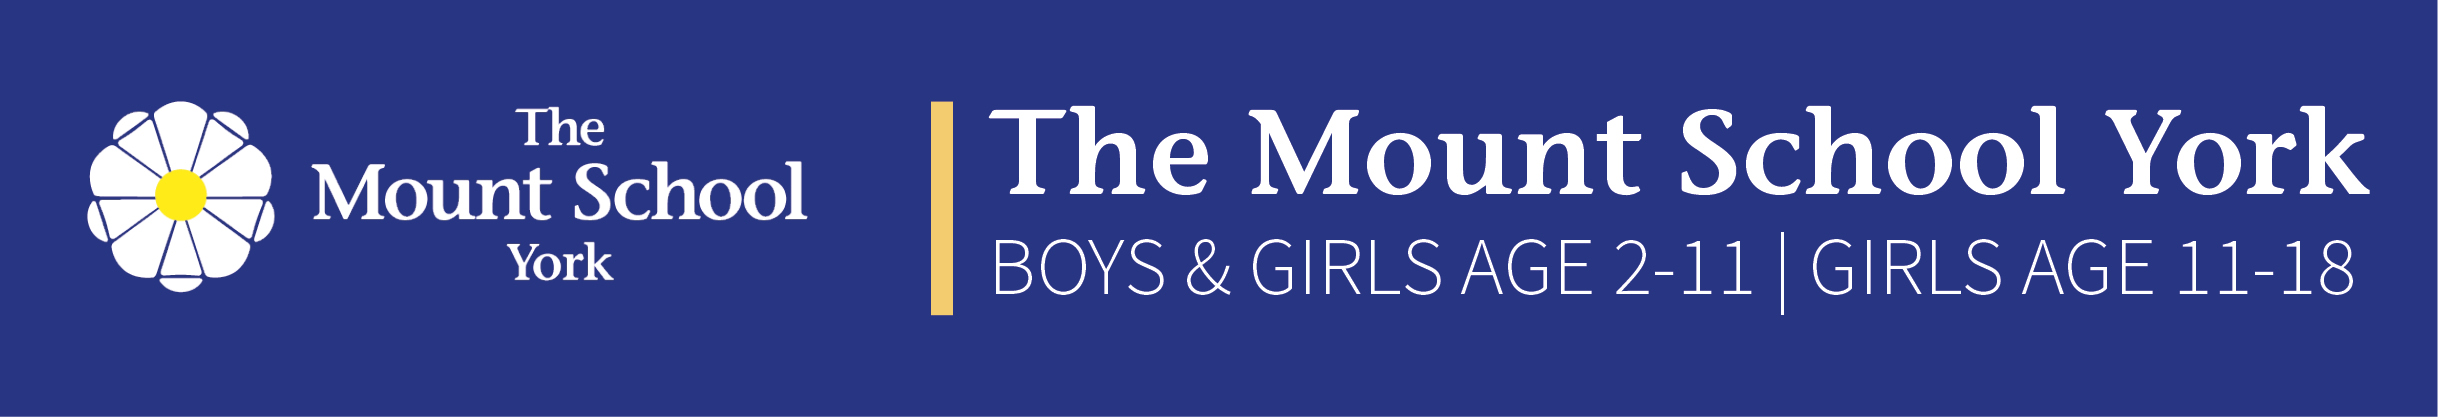 The Mount School logo